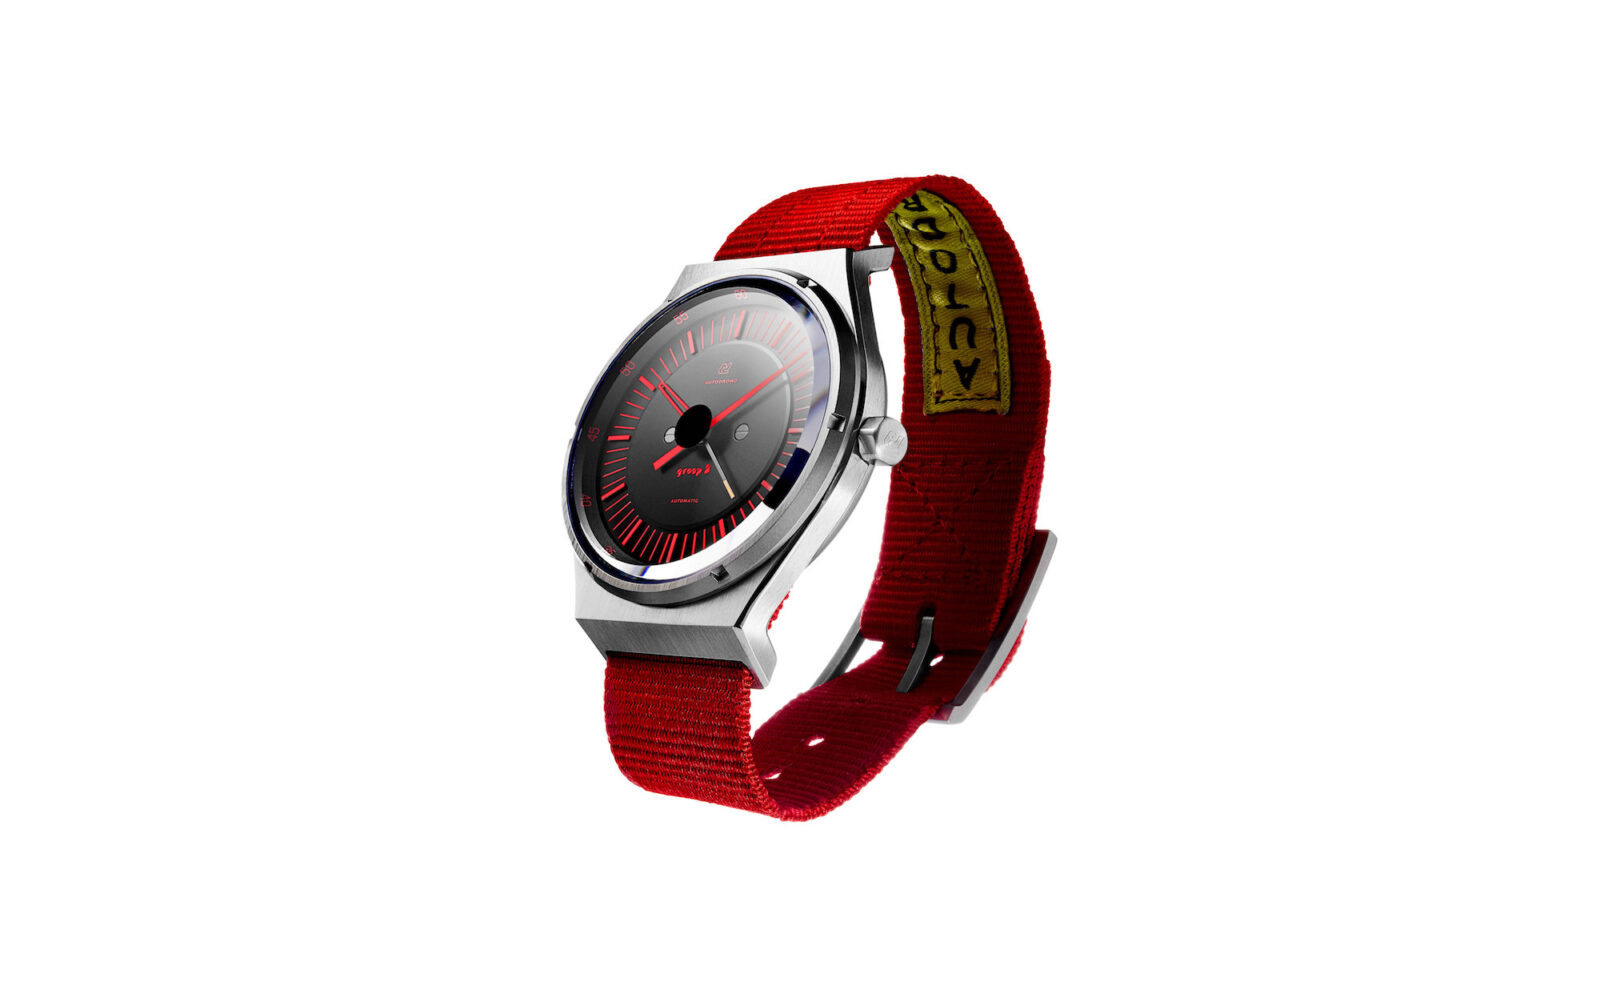 Autodromo Group B Watch 1600x982 - Autodromo Group B Watch